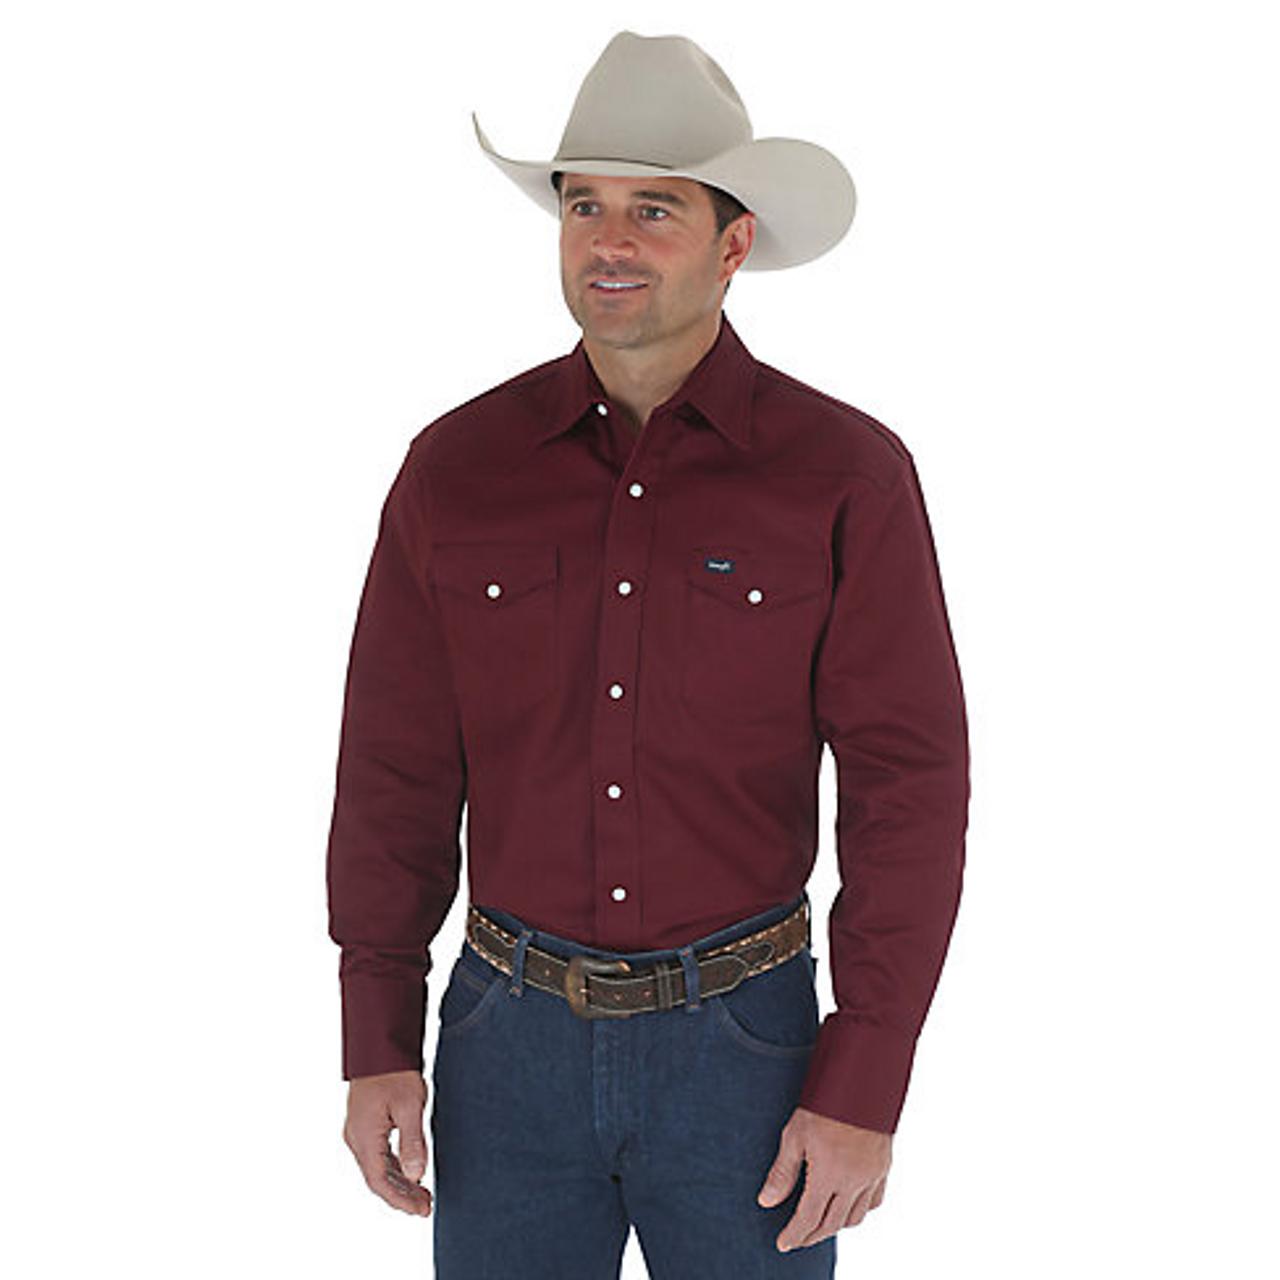 ae3c3bfff10 Wrangler Men s Work Shirt - Cowboy Cut - Red Oxide - Billy s Western ...